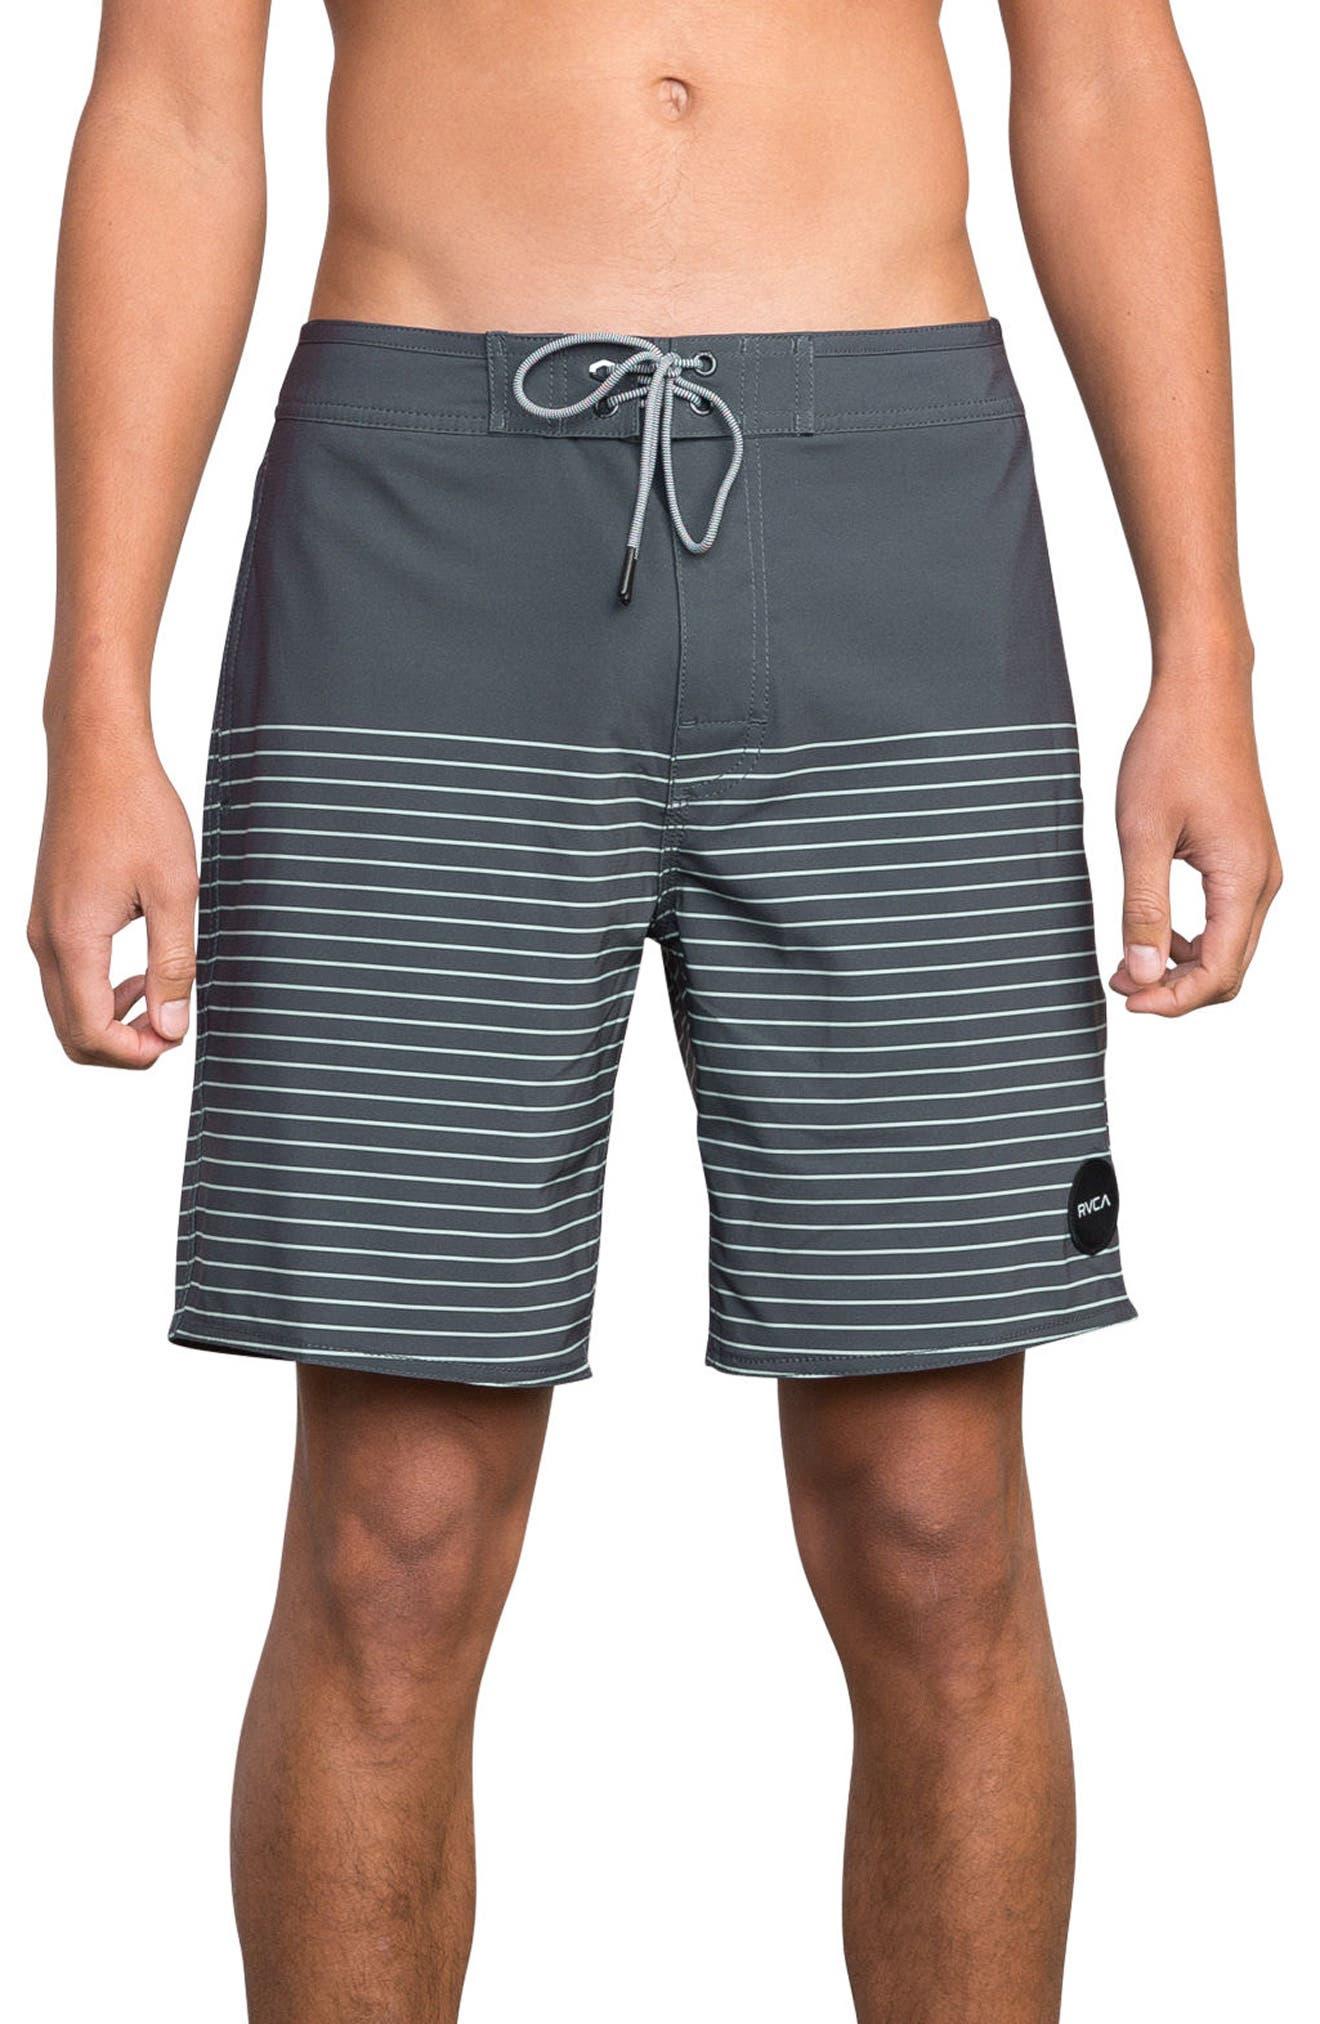 Curren Swim Trunks,                         Main,                         color, Slate